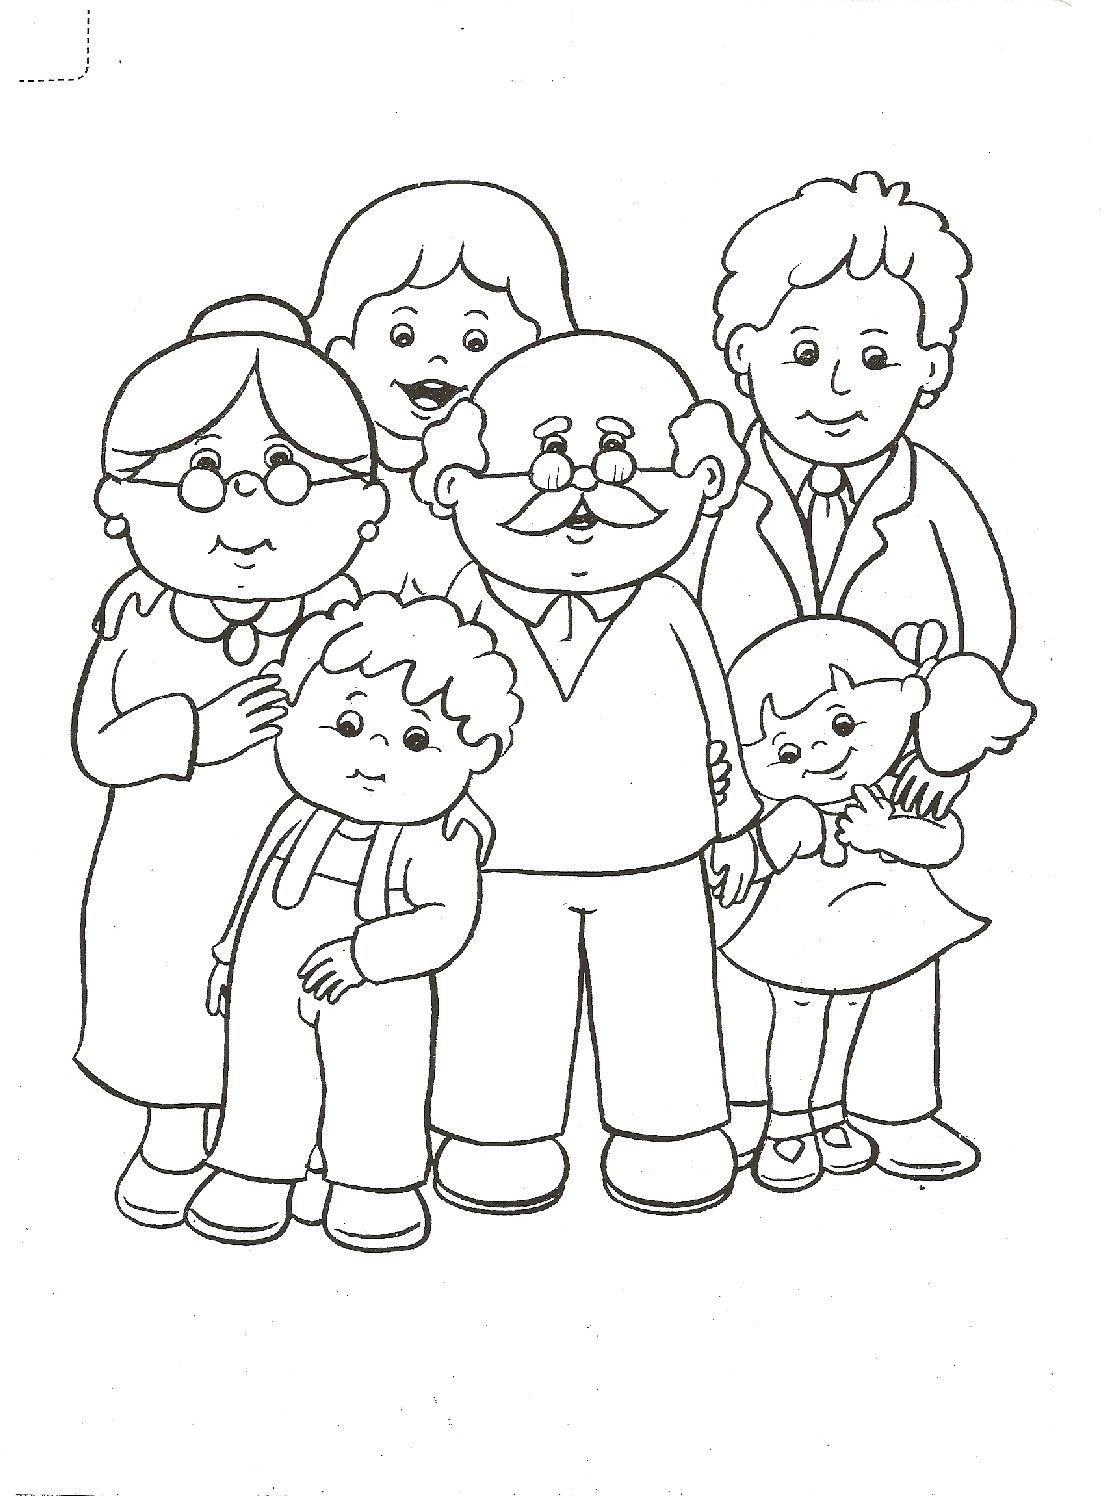 Desenho De Familia Para Colorir Pintar Imprimir Espaco Educar